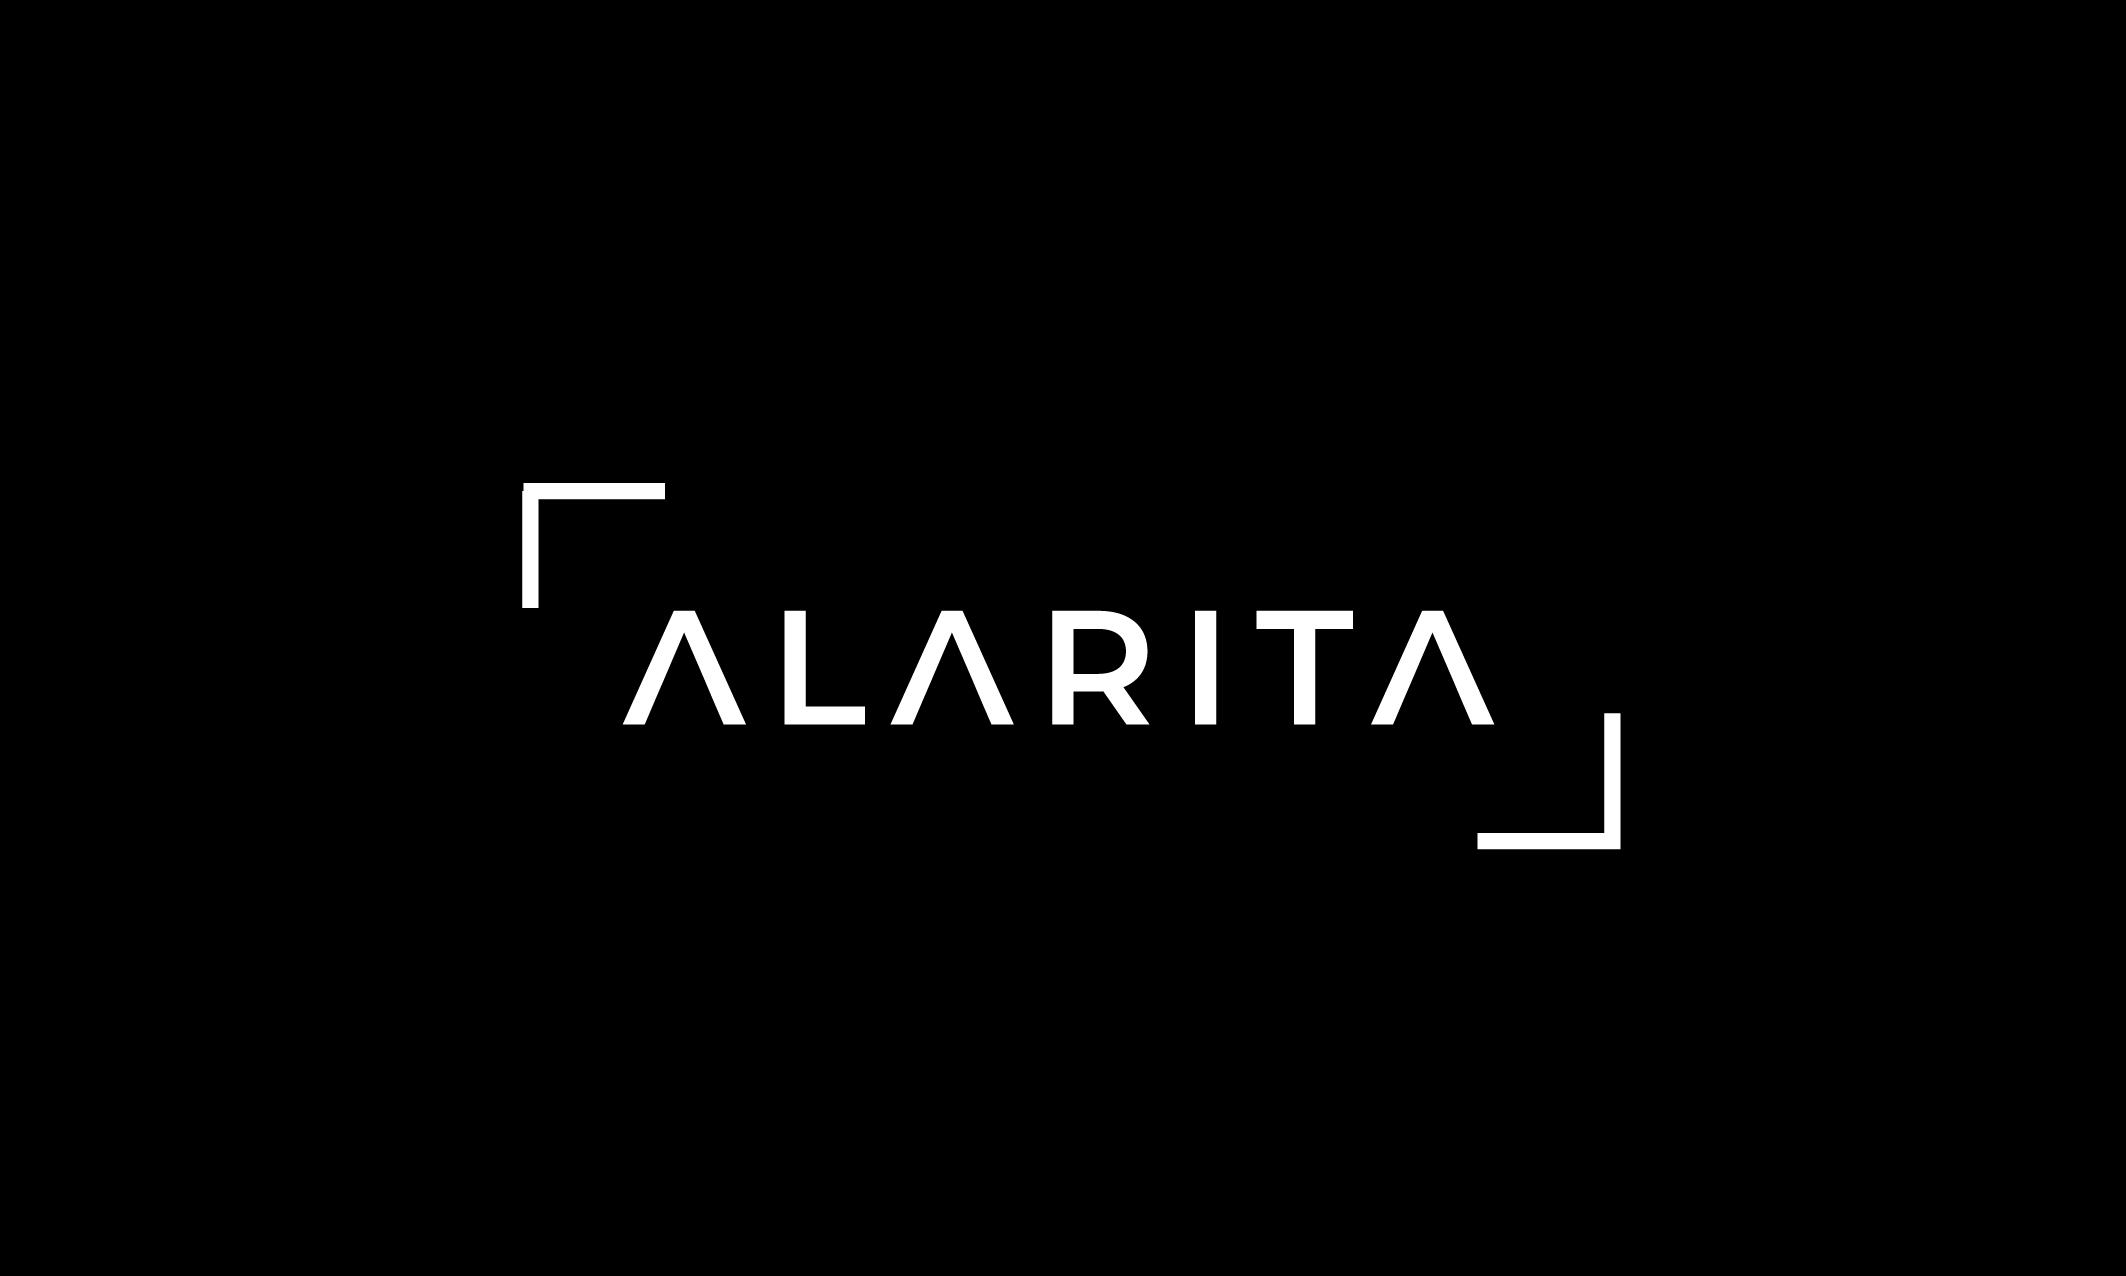 Alarita.com